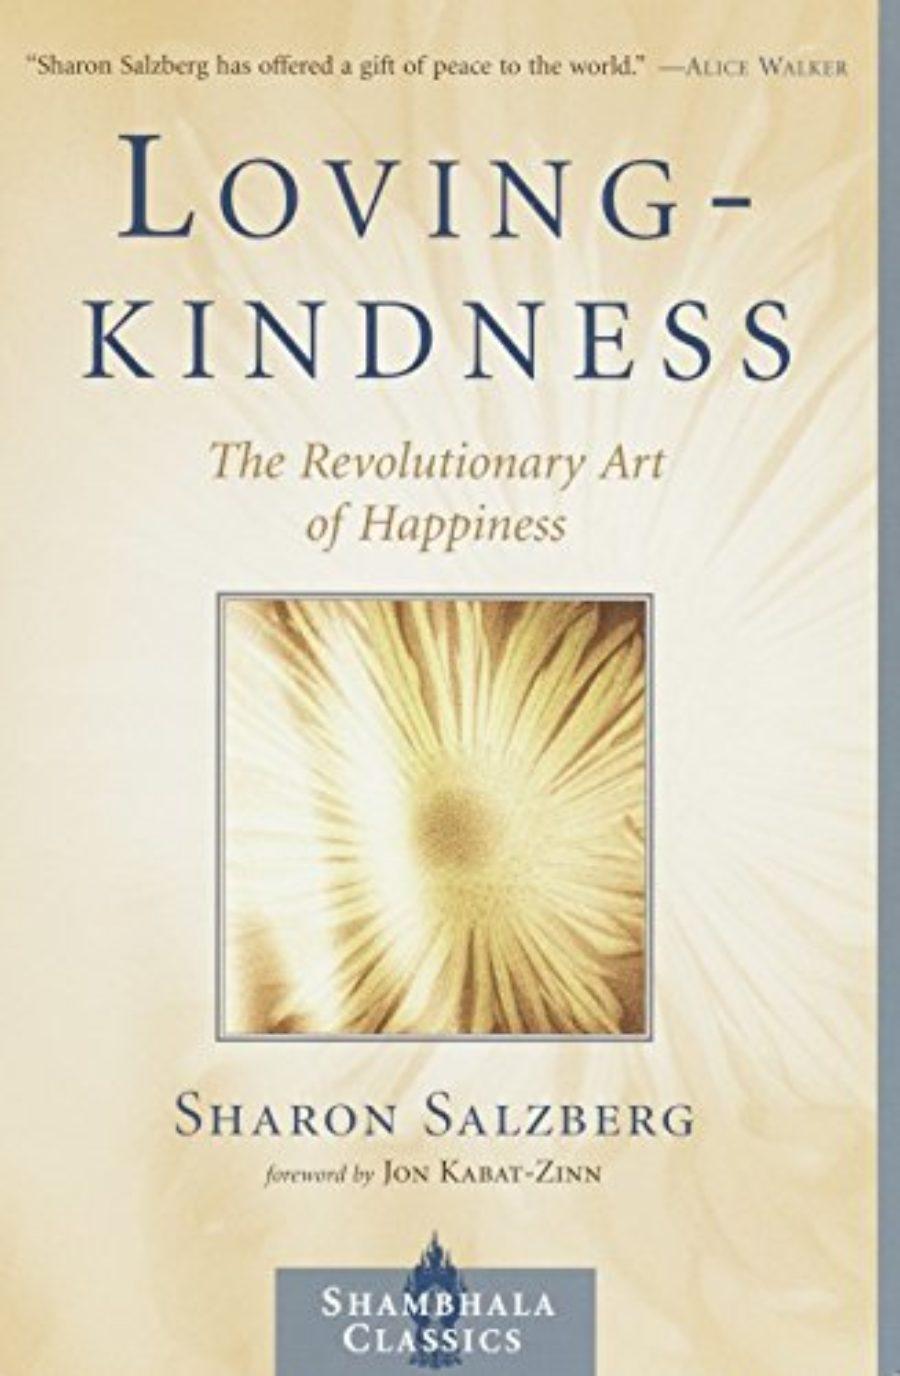 Cover of Lovingkindness: The Revolutionary Art of Happiness (Shambhala Classics)